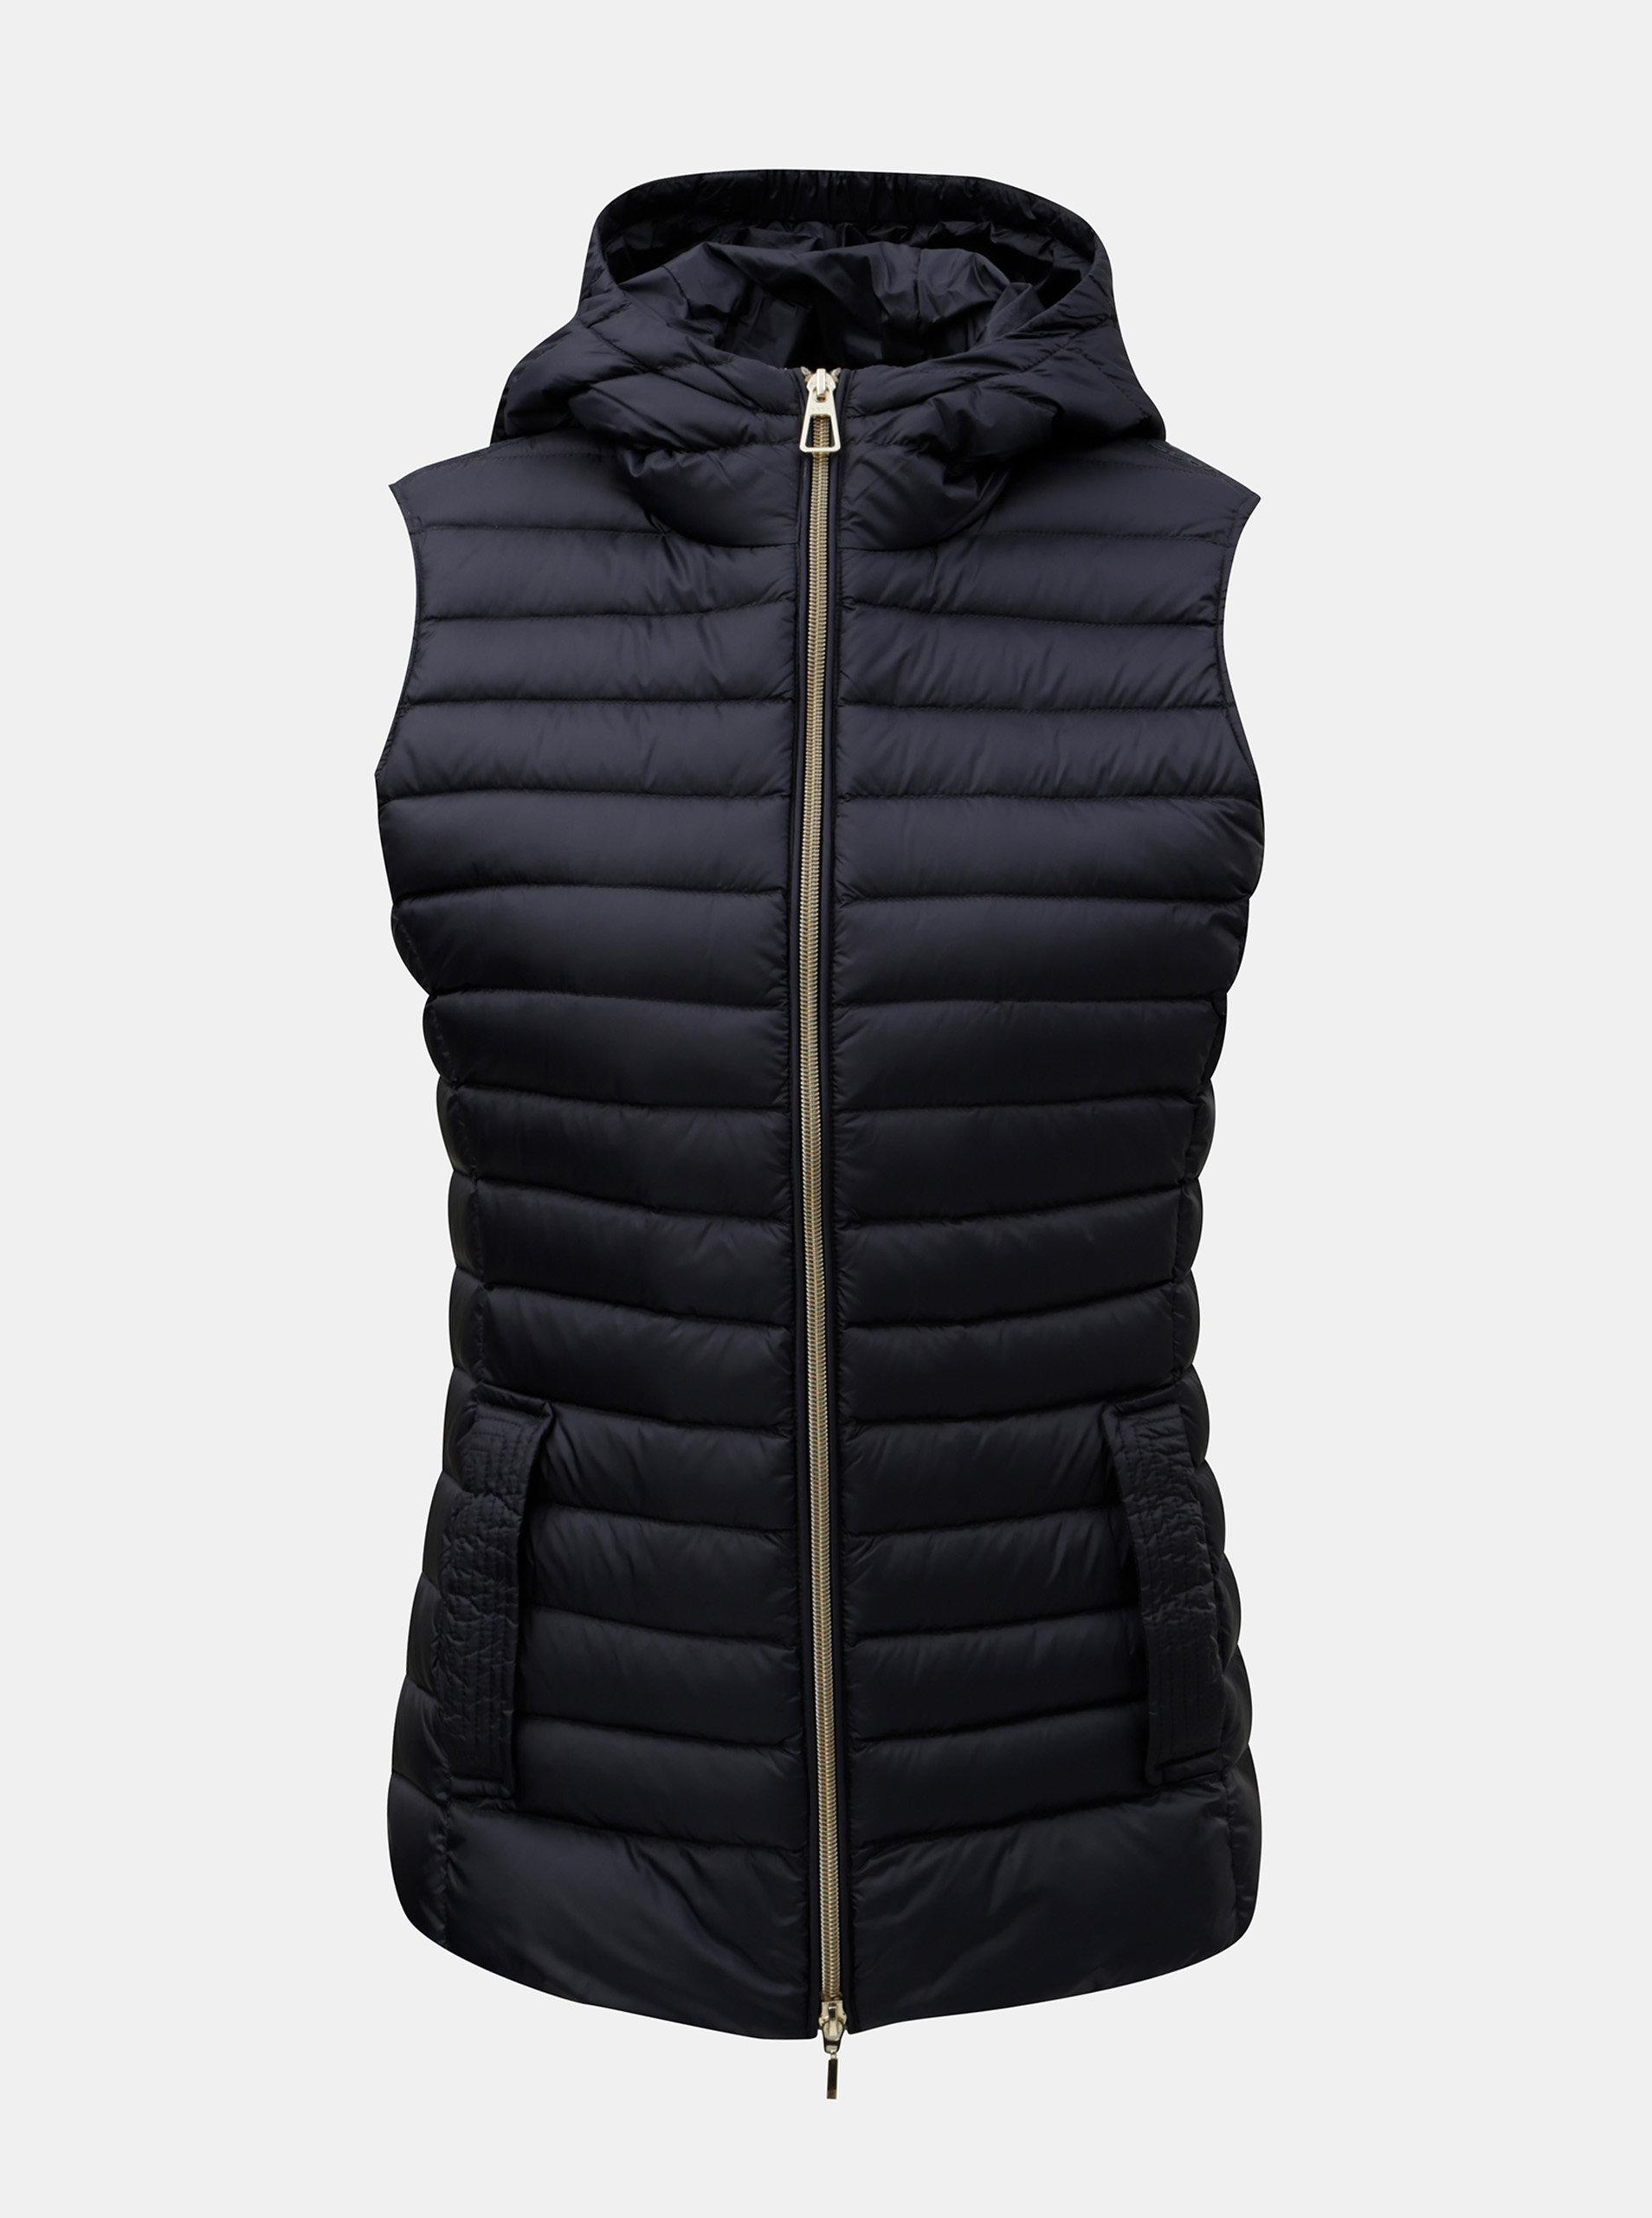 1daa9a2ce Tmavomodrá dámska prešívaná tenká páperová vesta s kapucňou Geox ...